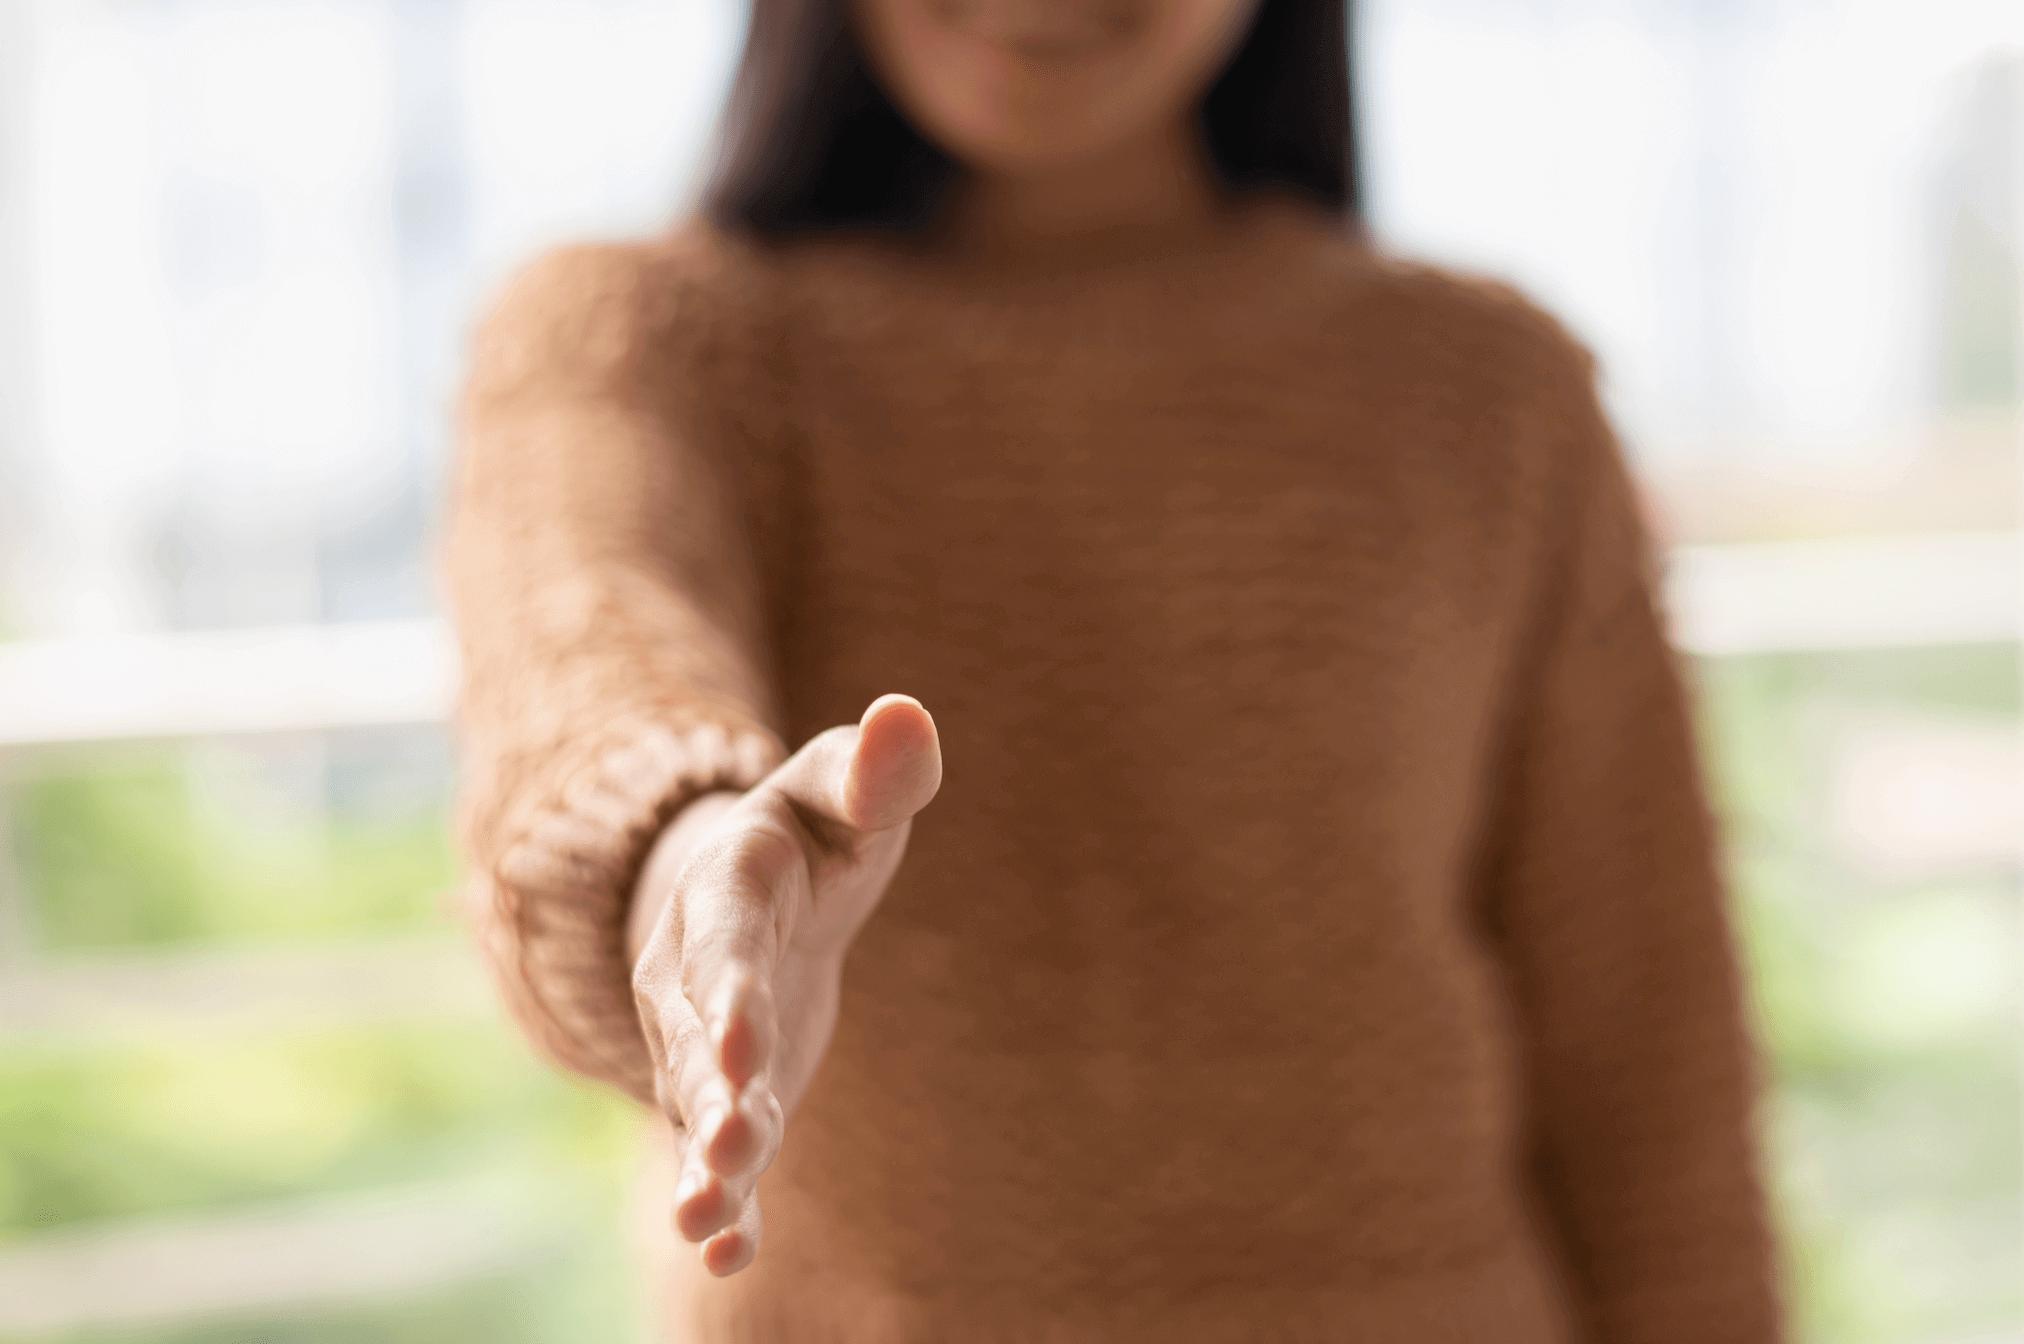 main tendue femme